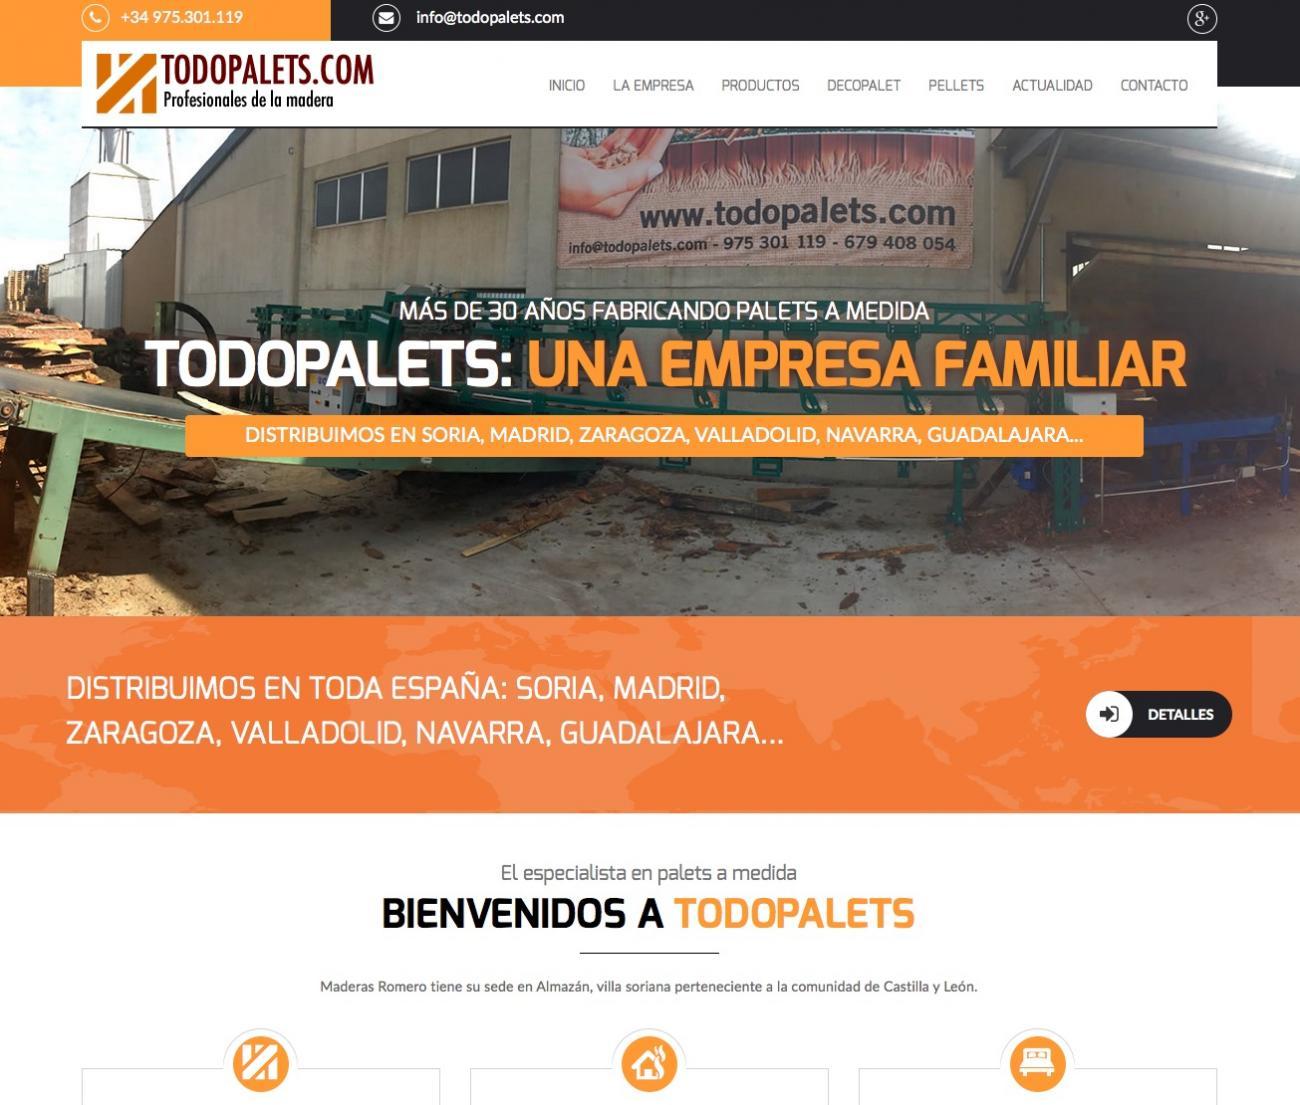 Todopalets: Reinauguramos nuestra nueva página web